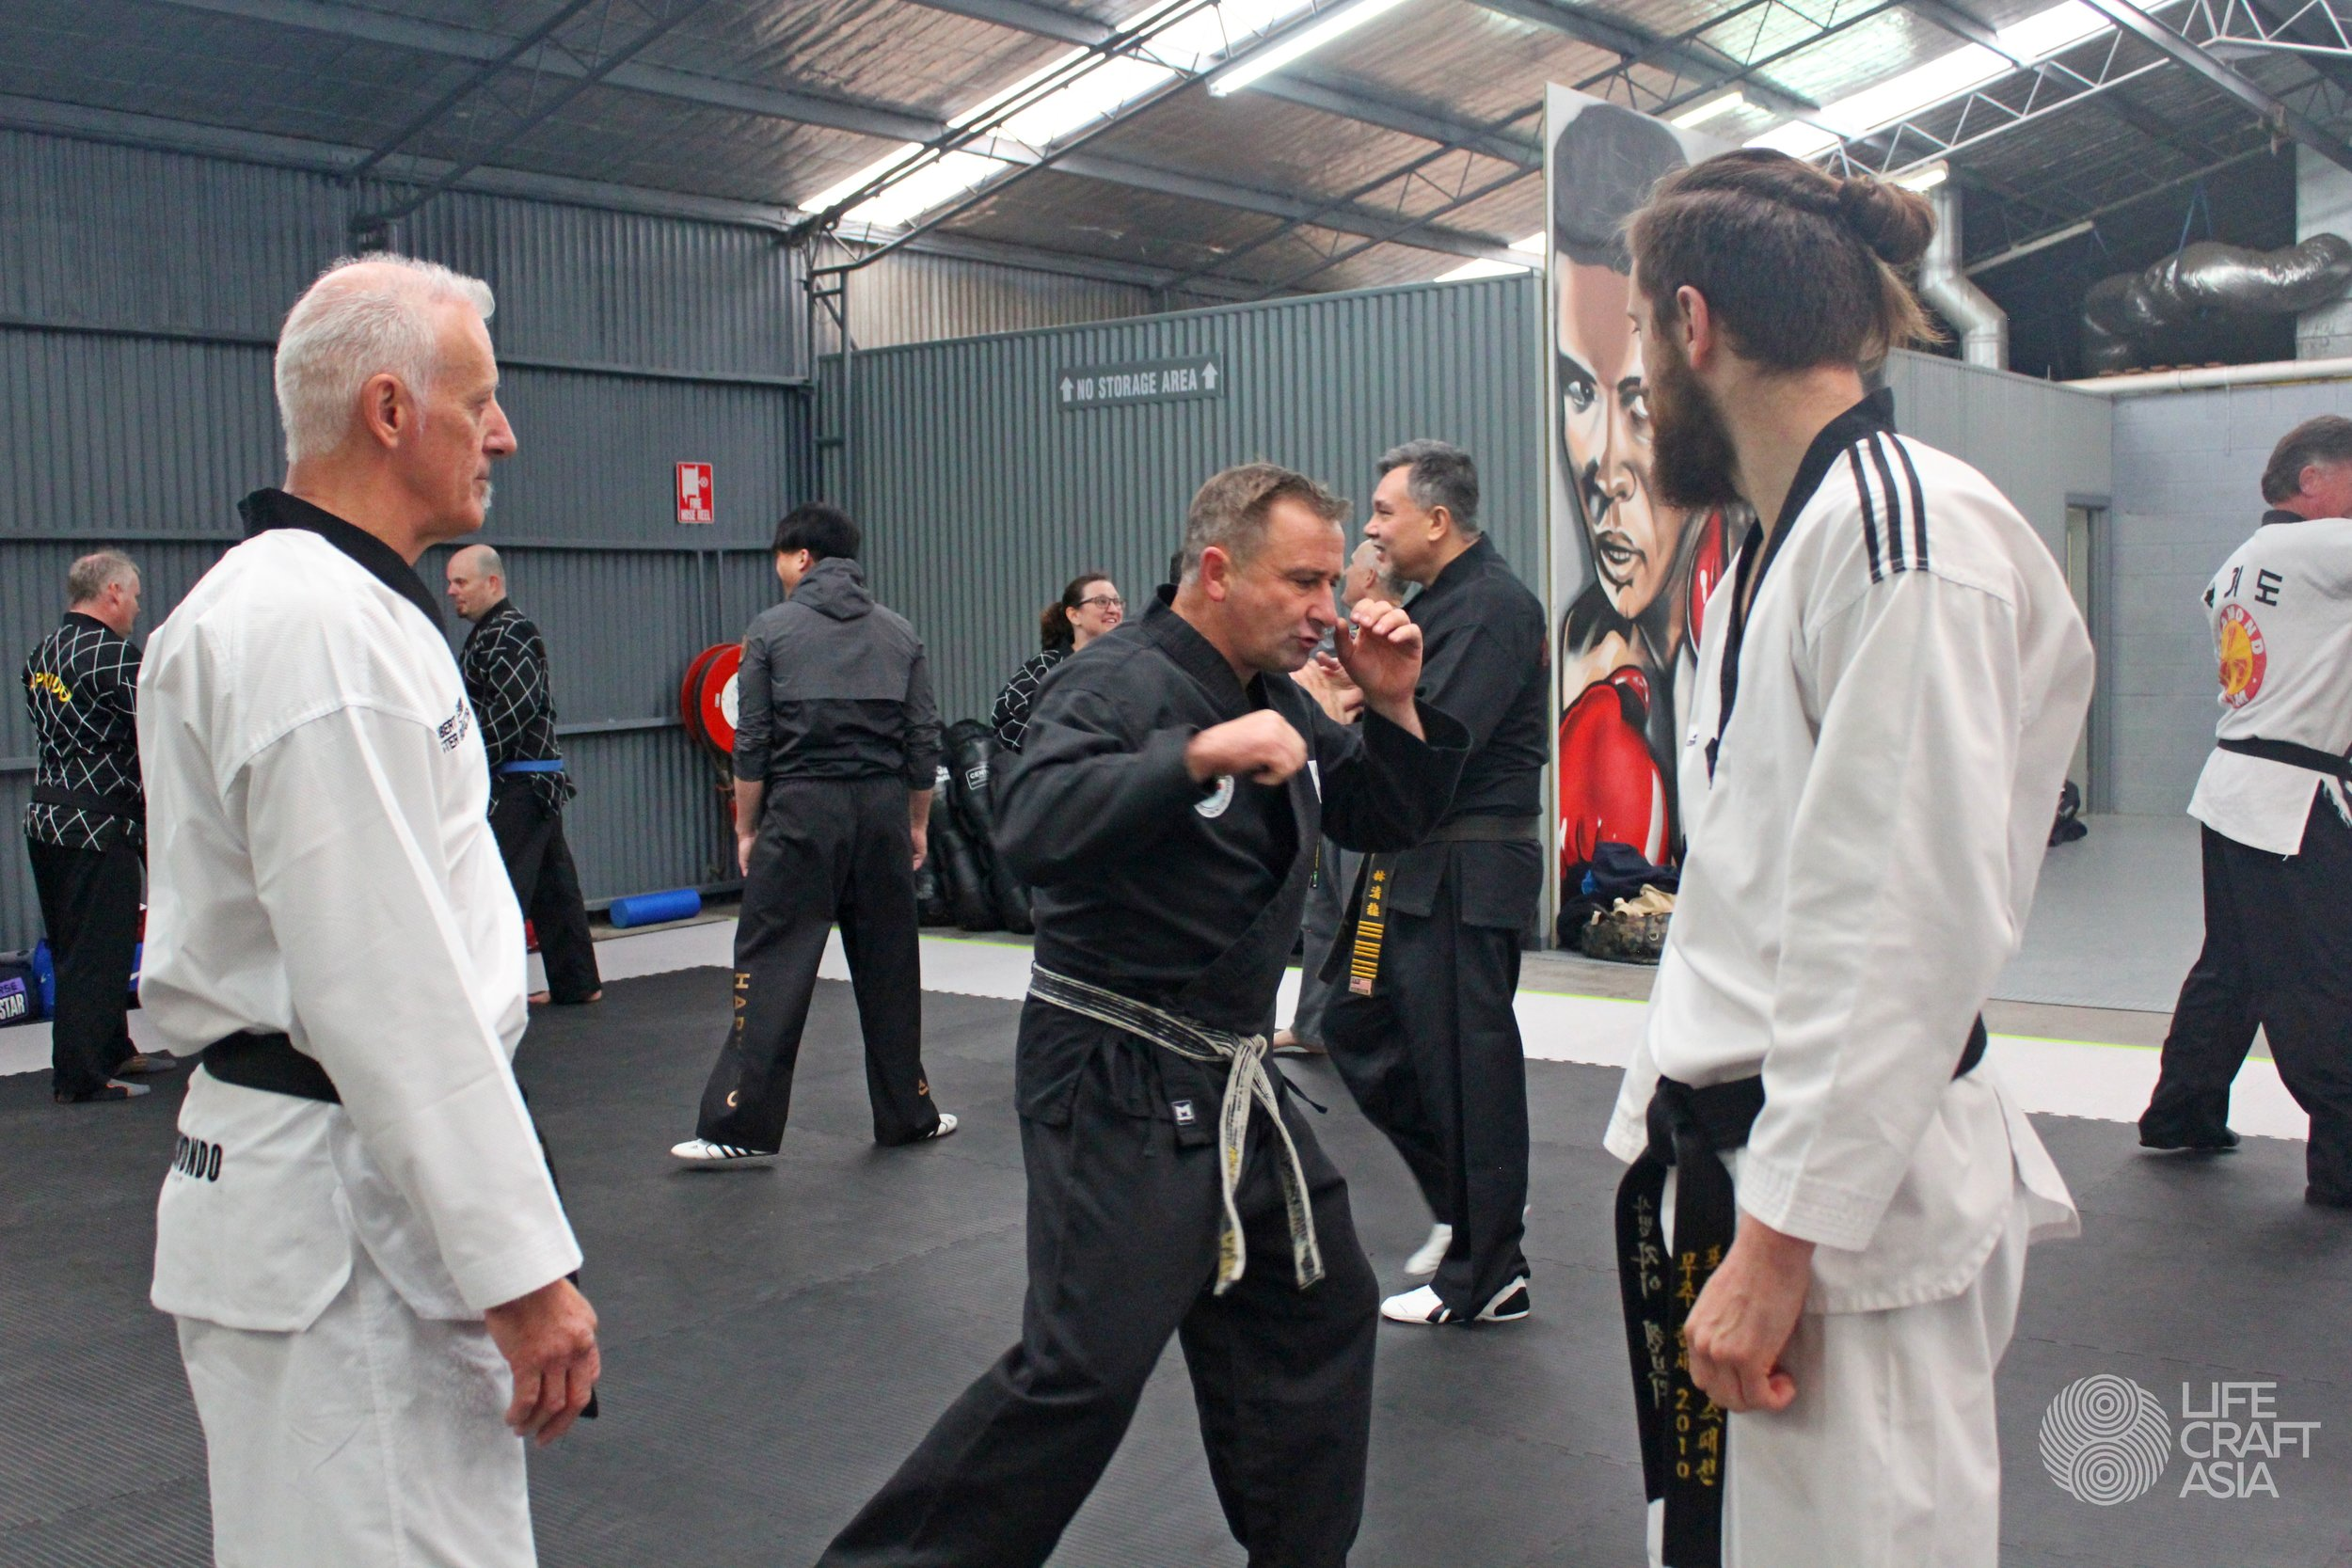 (Left) Grandmaster Robert Schembri (TKD), (Middle) Master Nigel May (Choson Martial Arts, representative of KOMA, KIDO and LifeCraft Australia), (Right) Master Jay K Schembri (TKD)